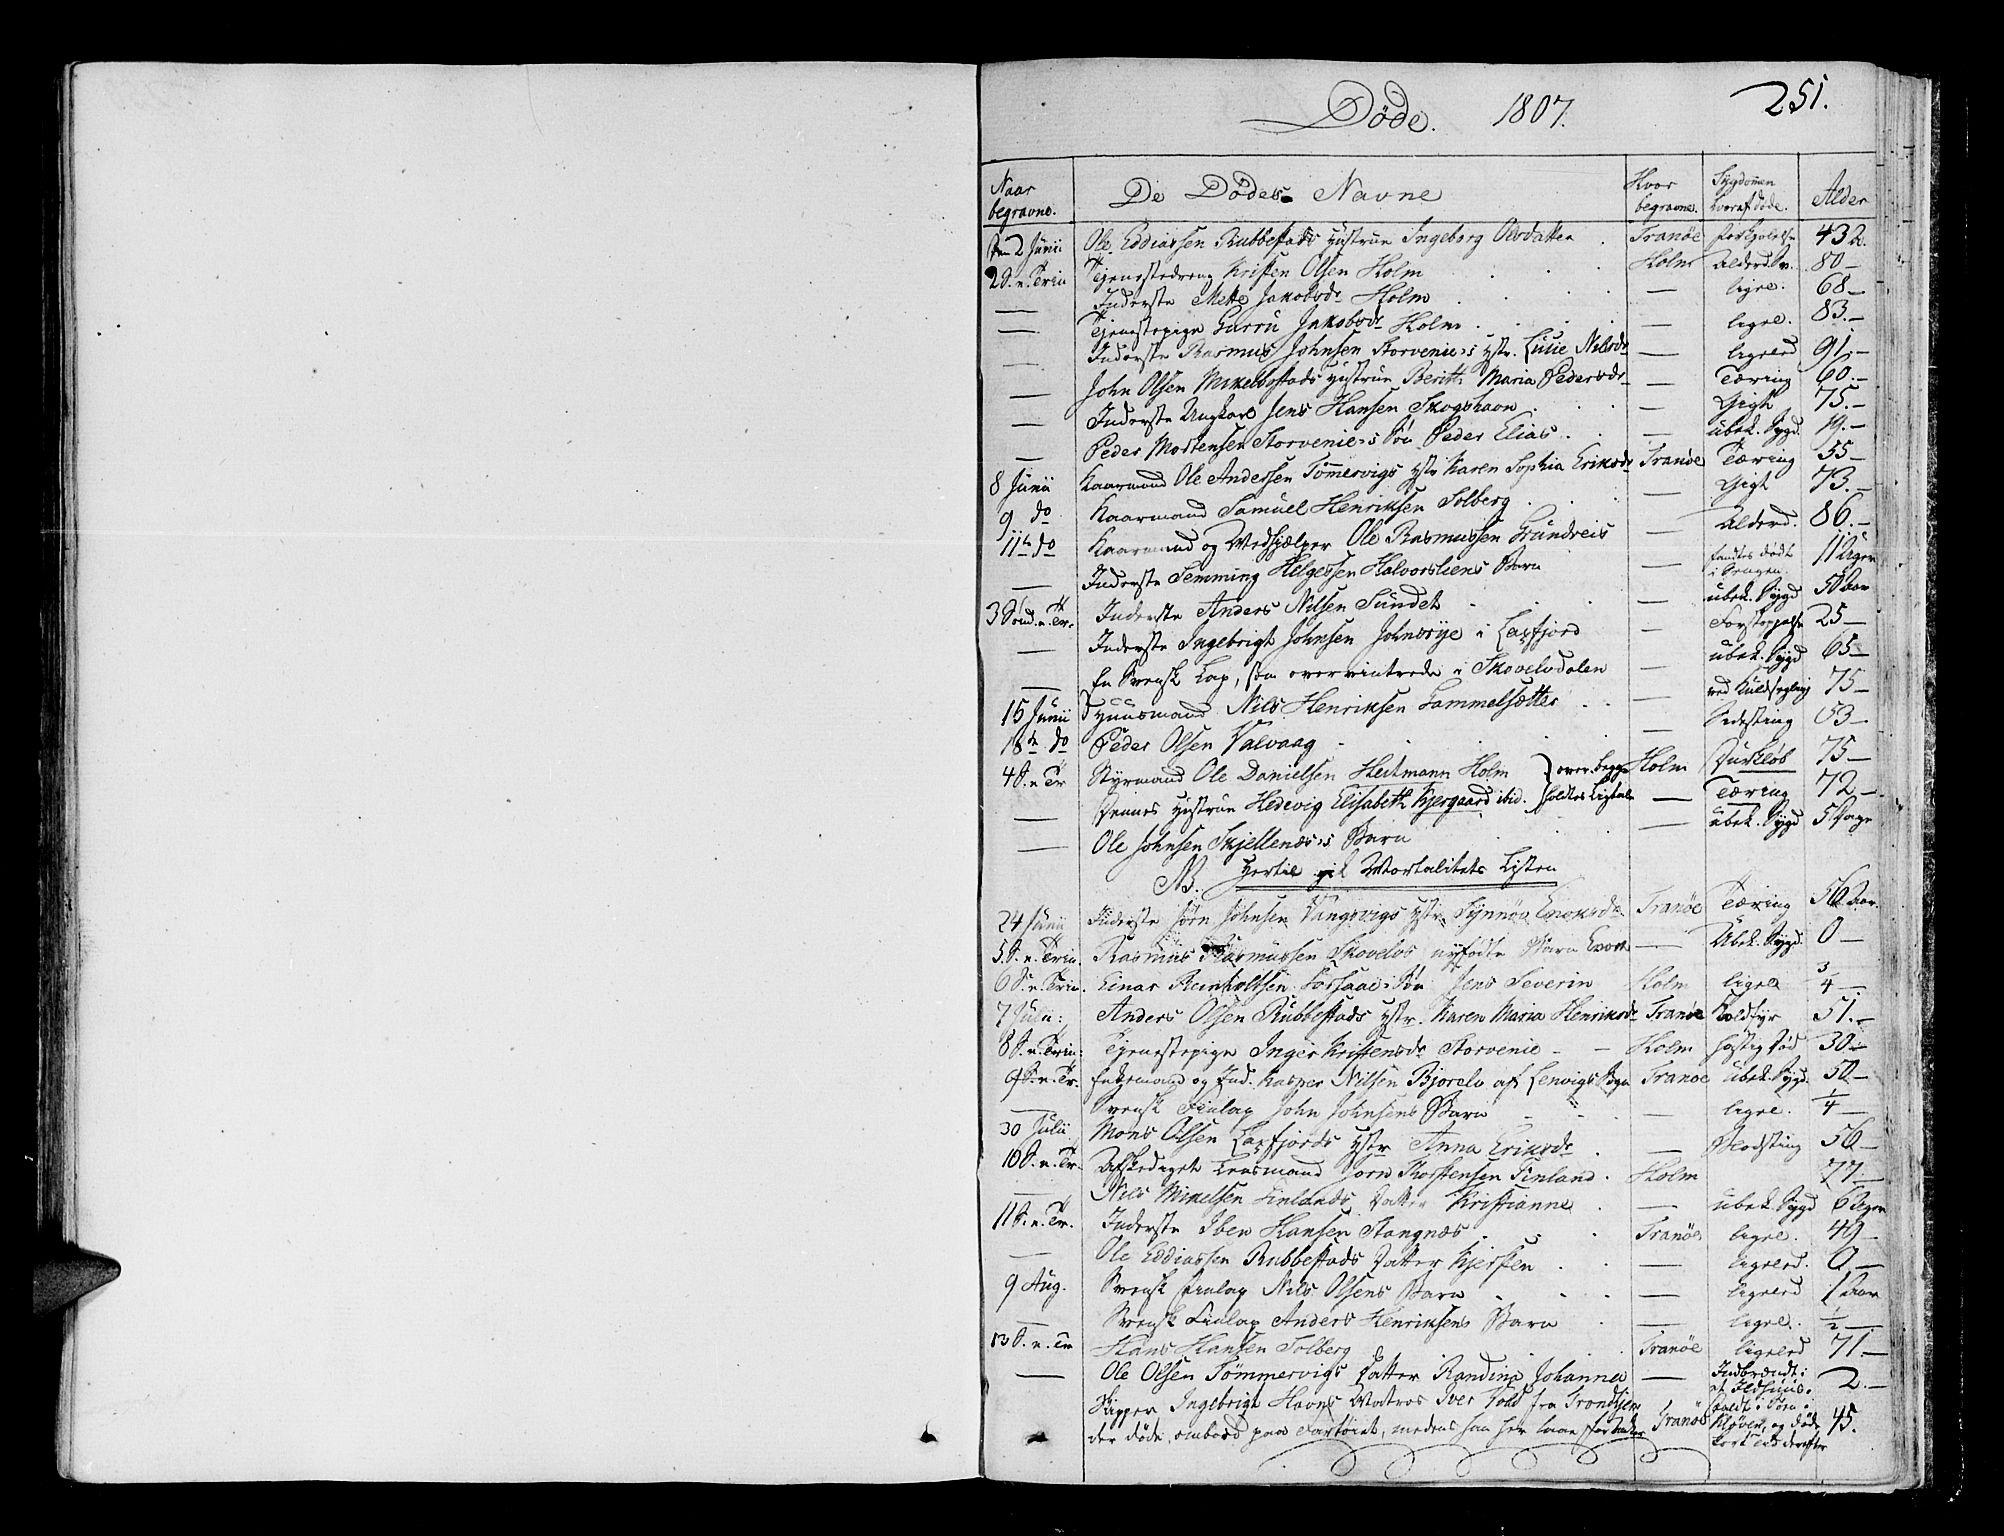 SATØ, Tranøy sokneprestkontor, I/Ia/Iaa/L0003kirke: Ministerialbok nr. 3, 1807-1820, s. 251